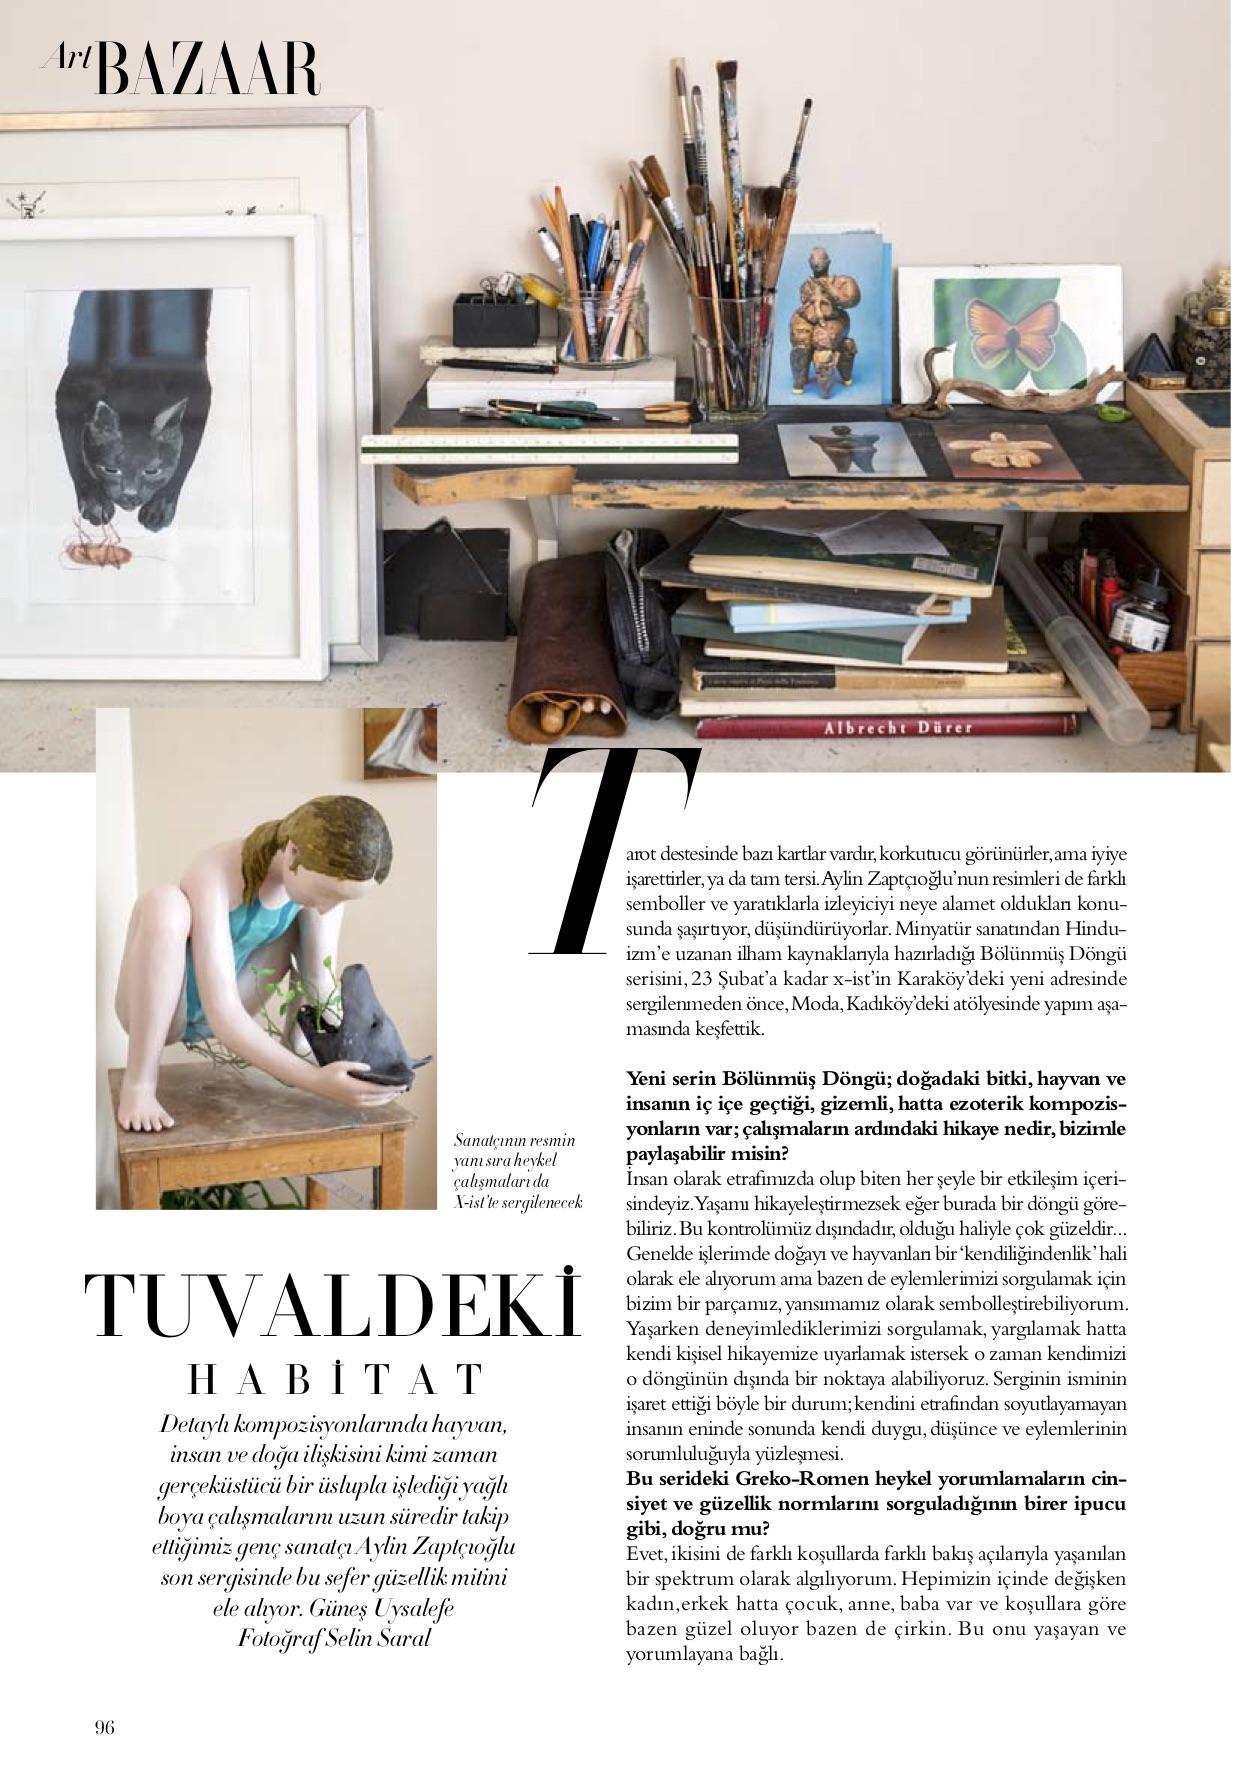 Harpers Bazaar Aylin Zaptcioglu.jpg